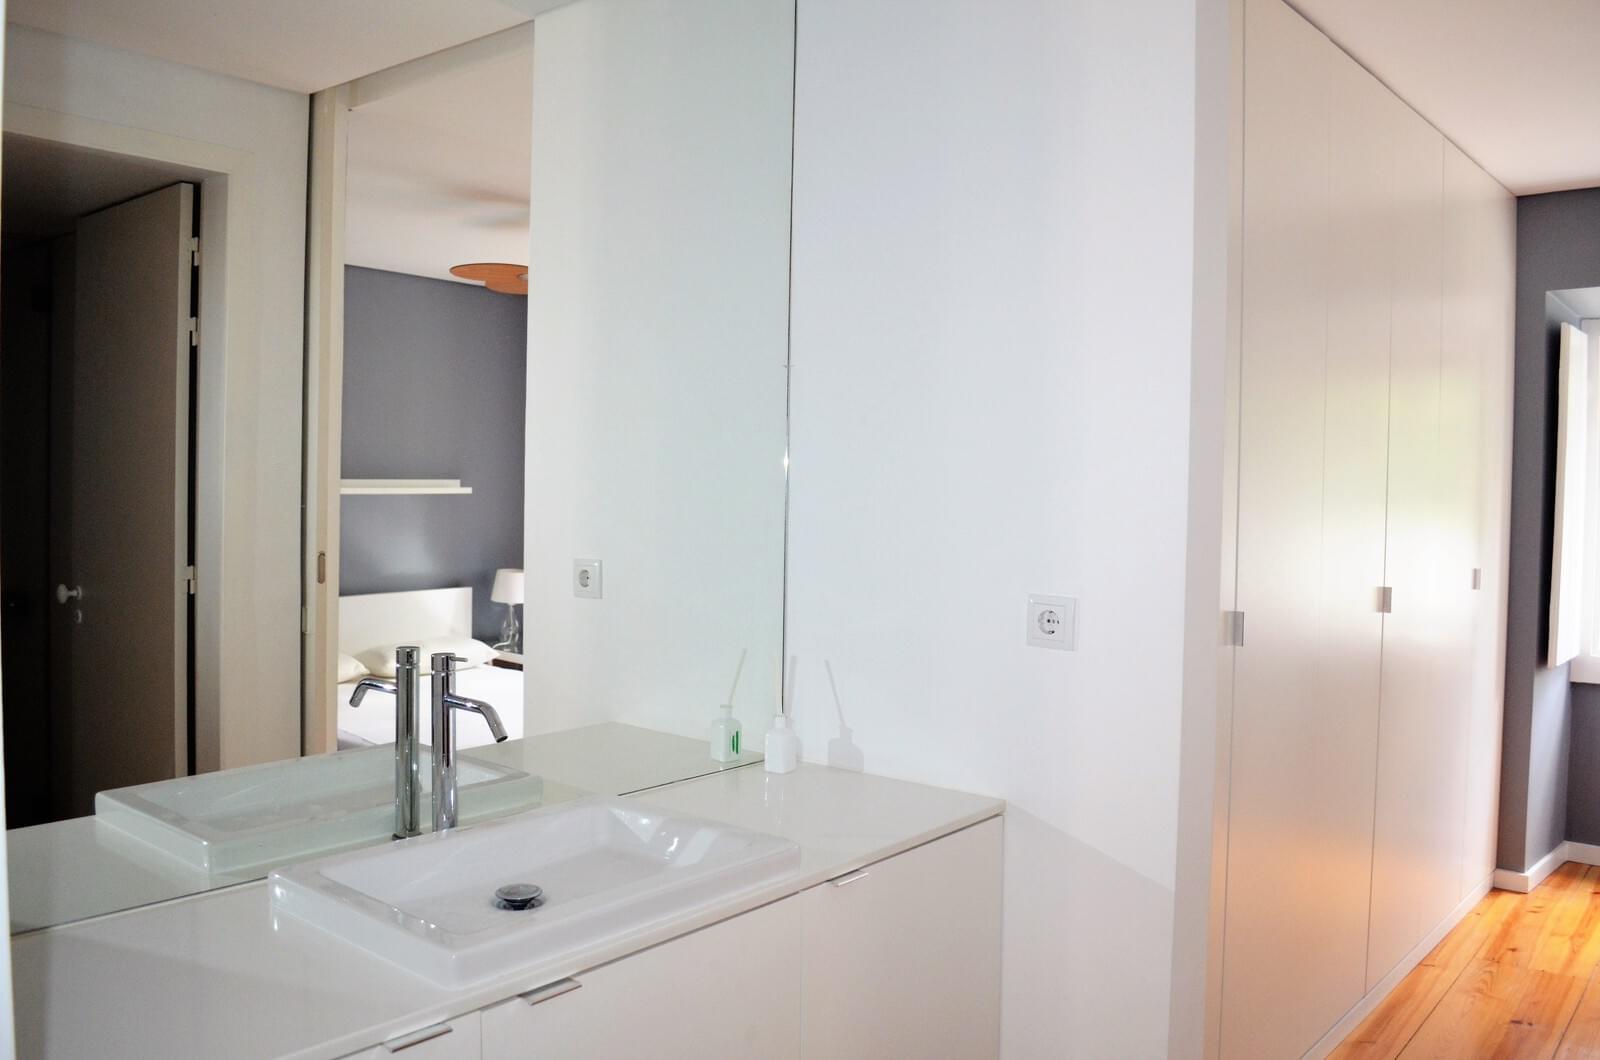 pf17785-apartamento-t1-lisboa-753249b2-69e5-44ca-970a-e4cb7a94d1c3